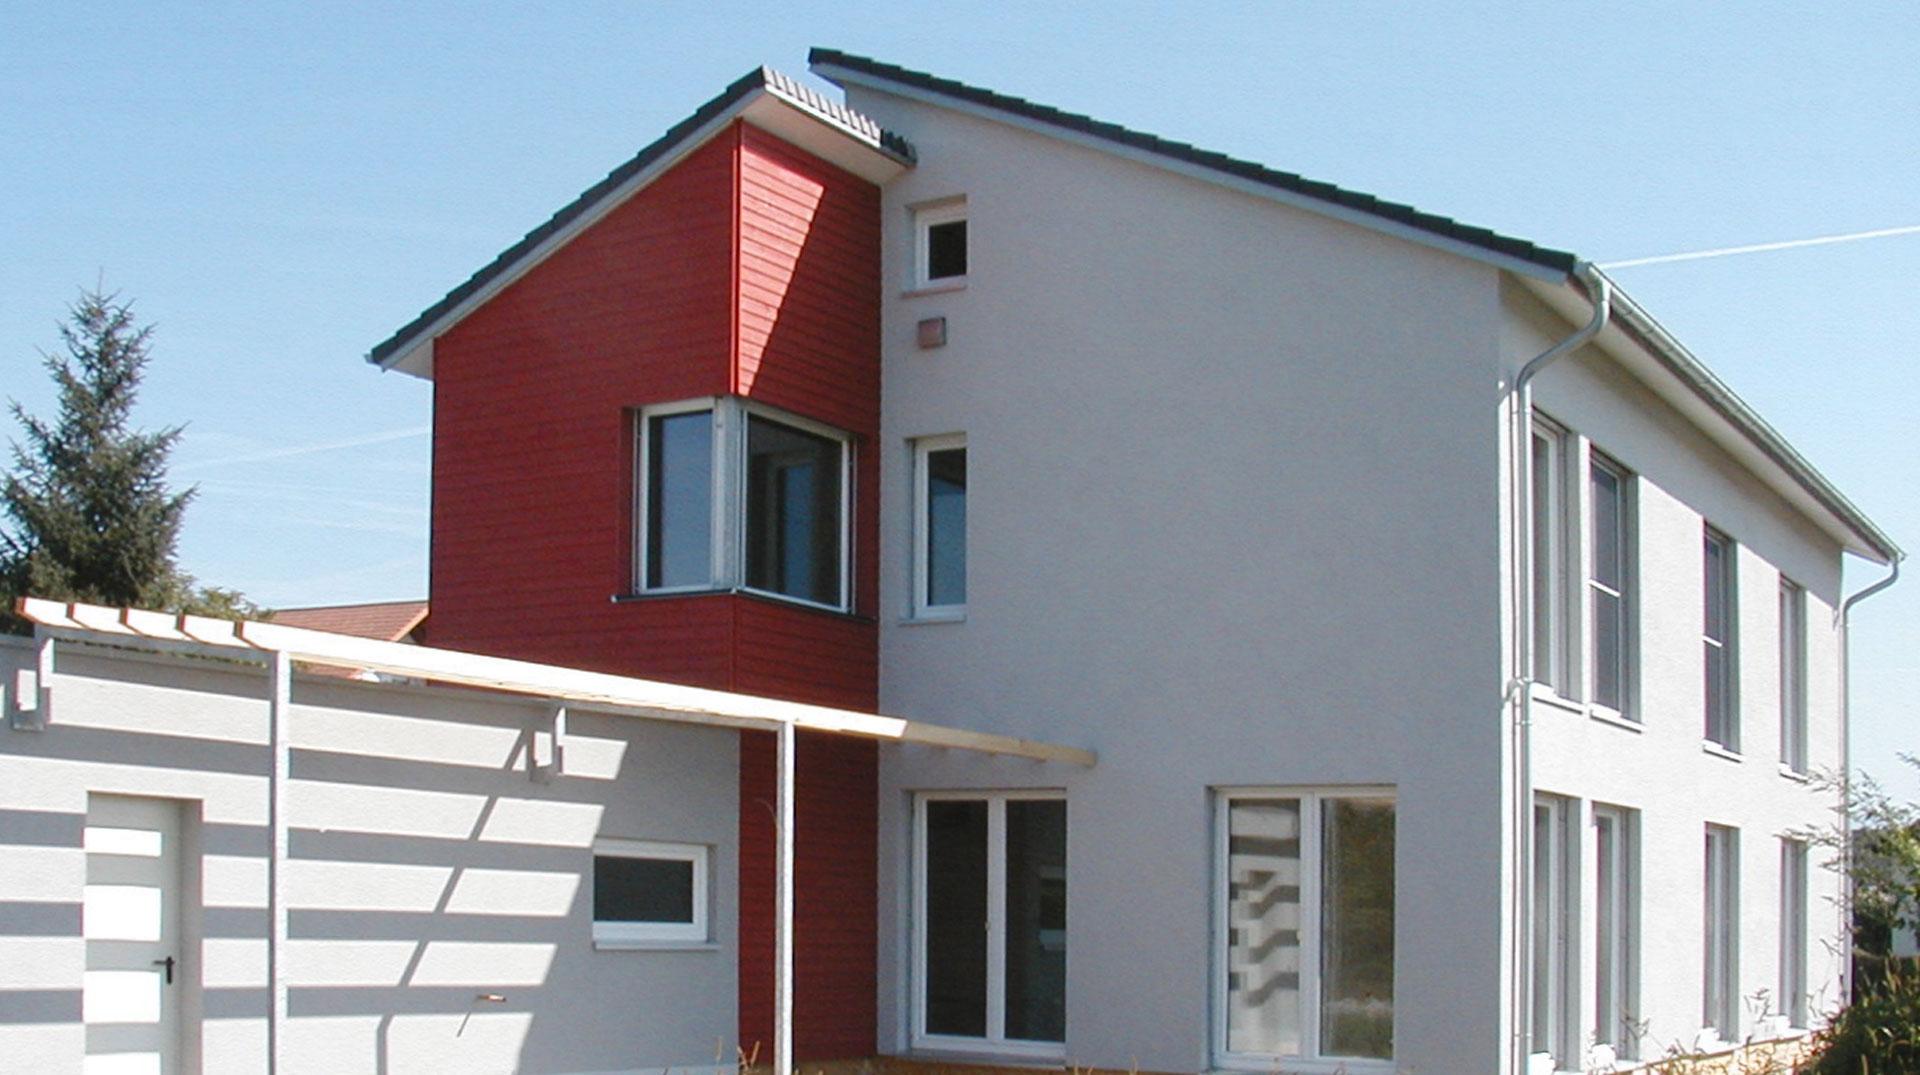 Einfamilienhaus, Passivhaus, Karlsruhe